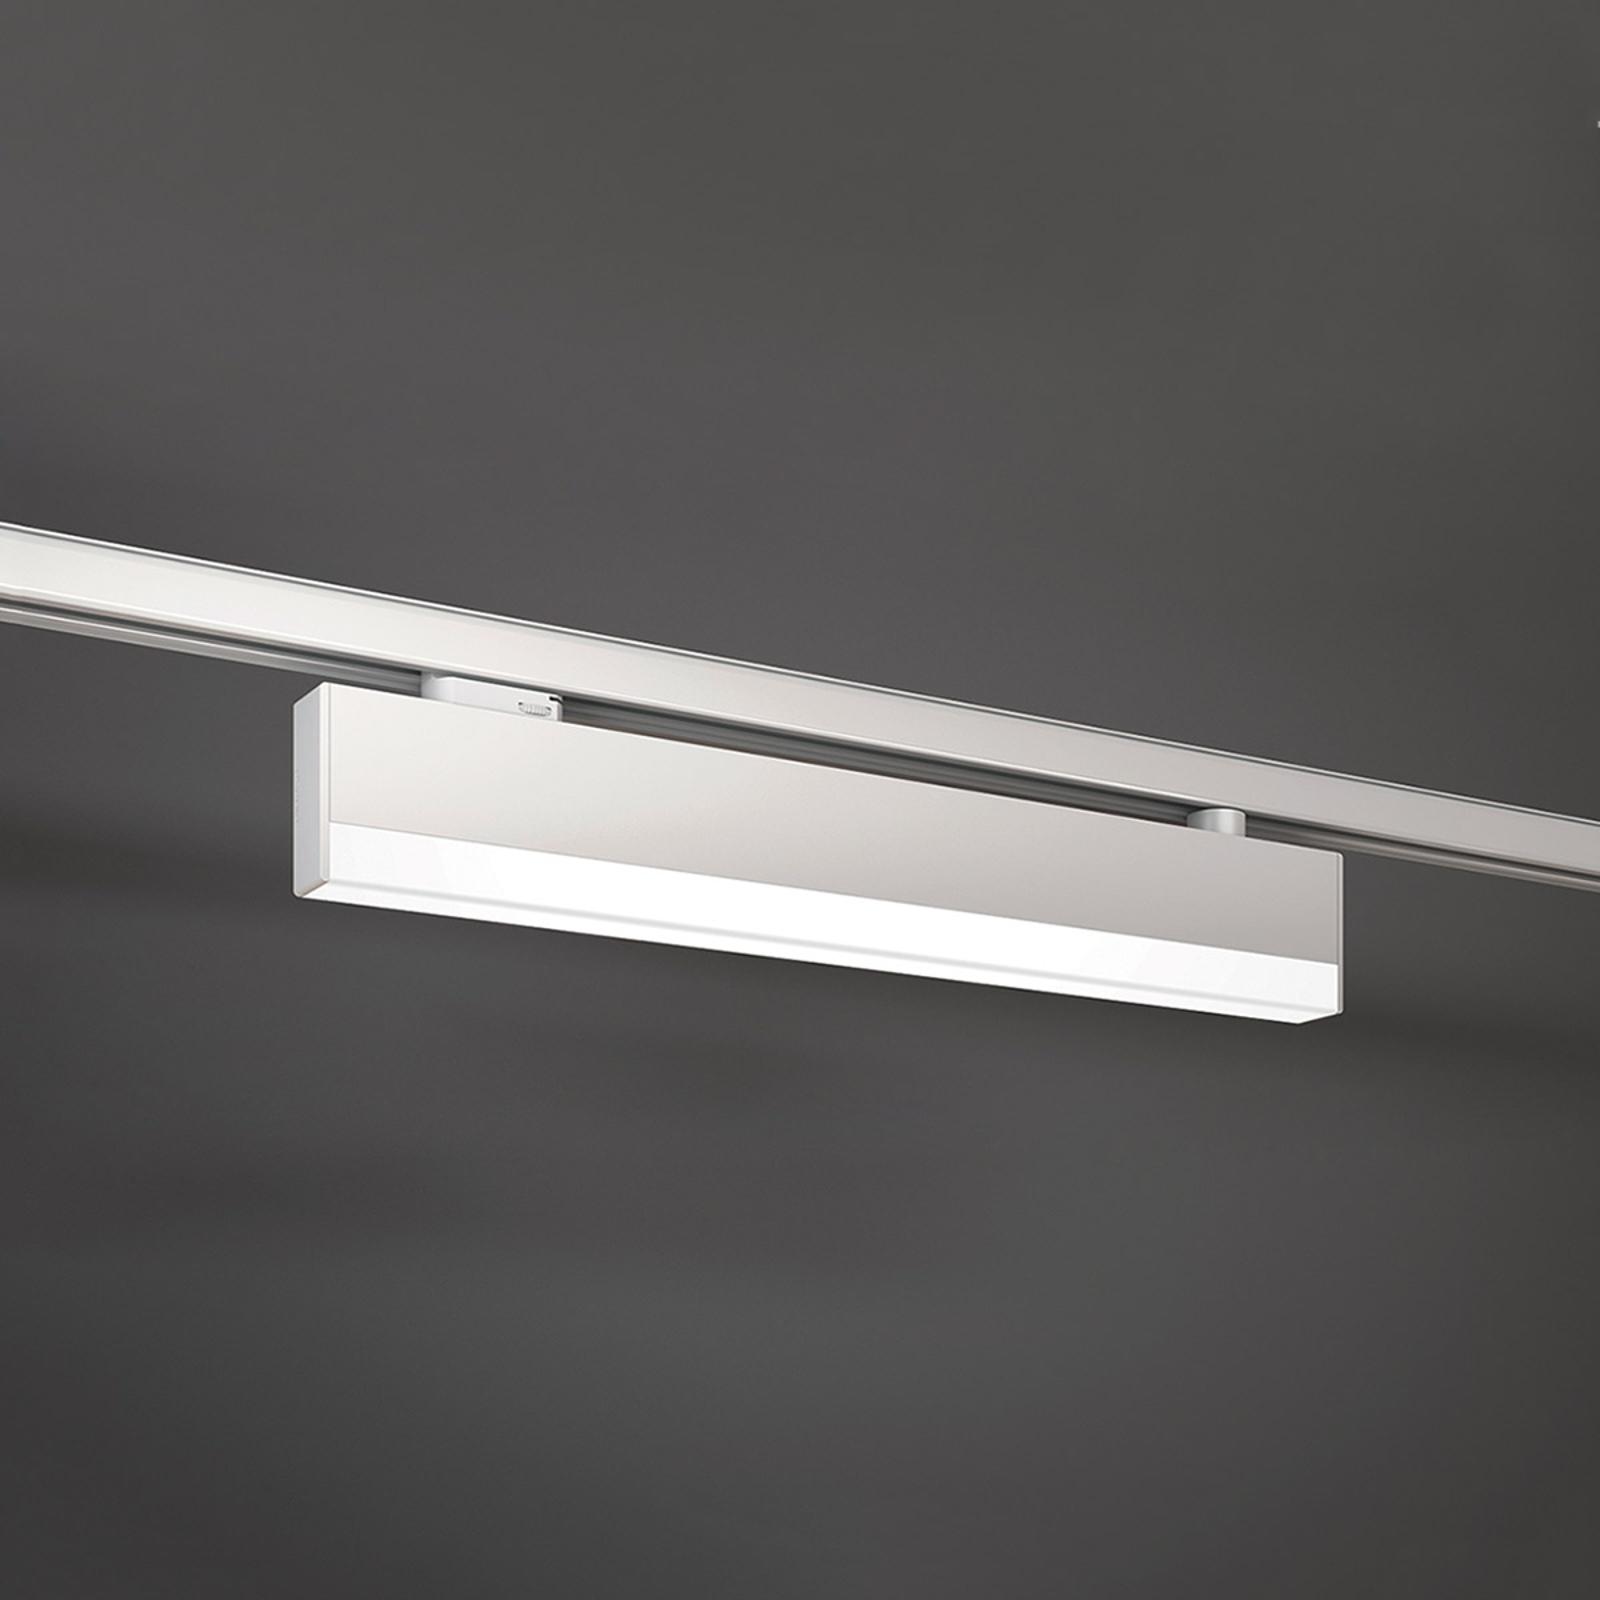 Helle LED lamp voor 3-fasen railsysteem, wit